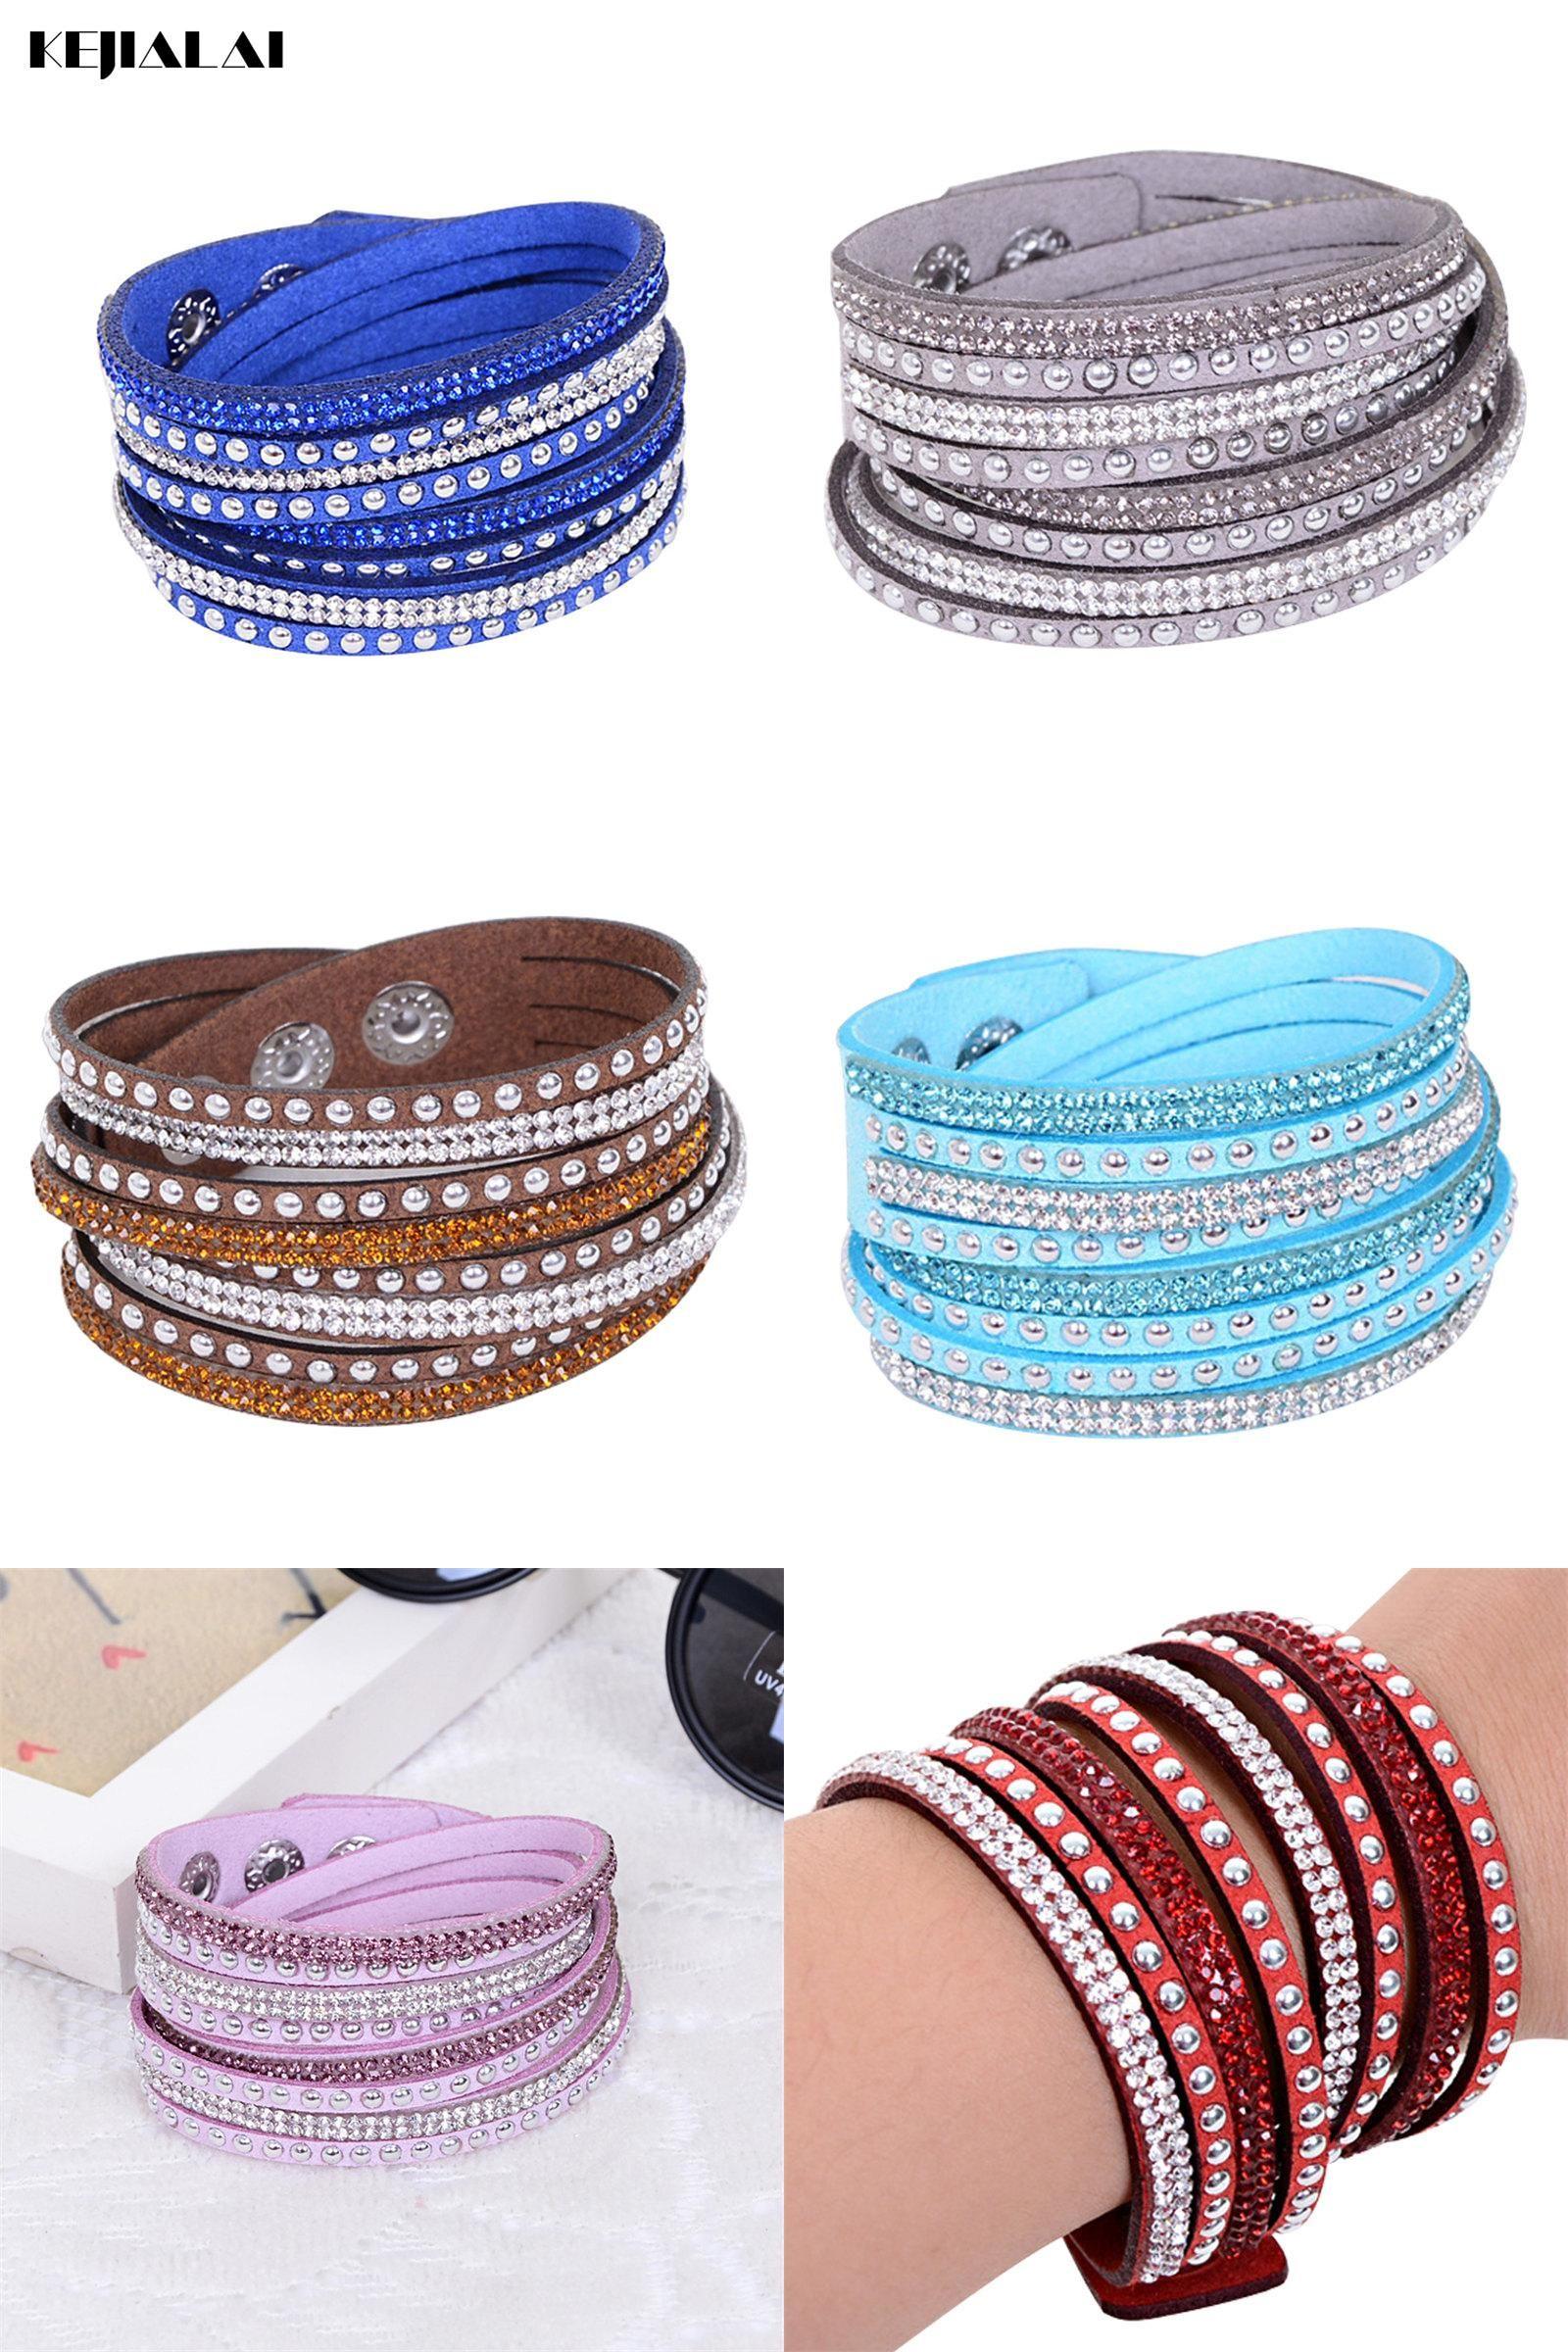 Visit to buy wrap bracelet for women leather crystal bracelet with